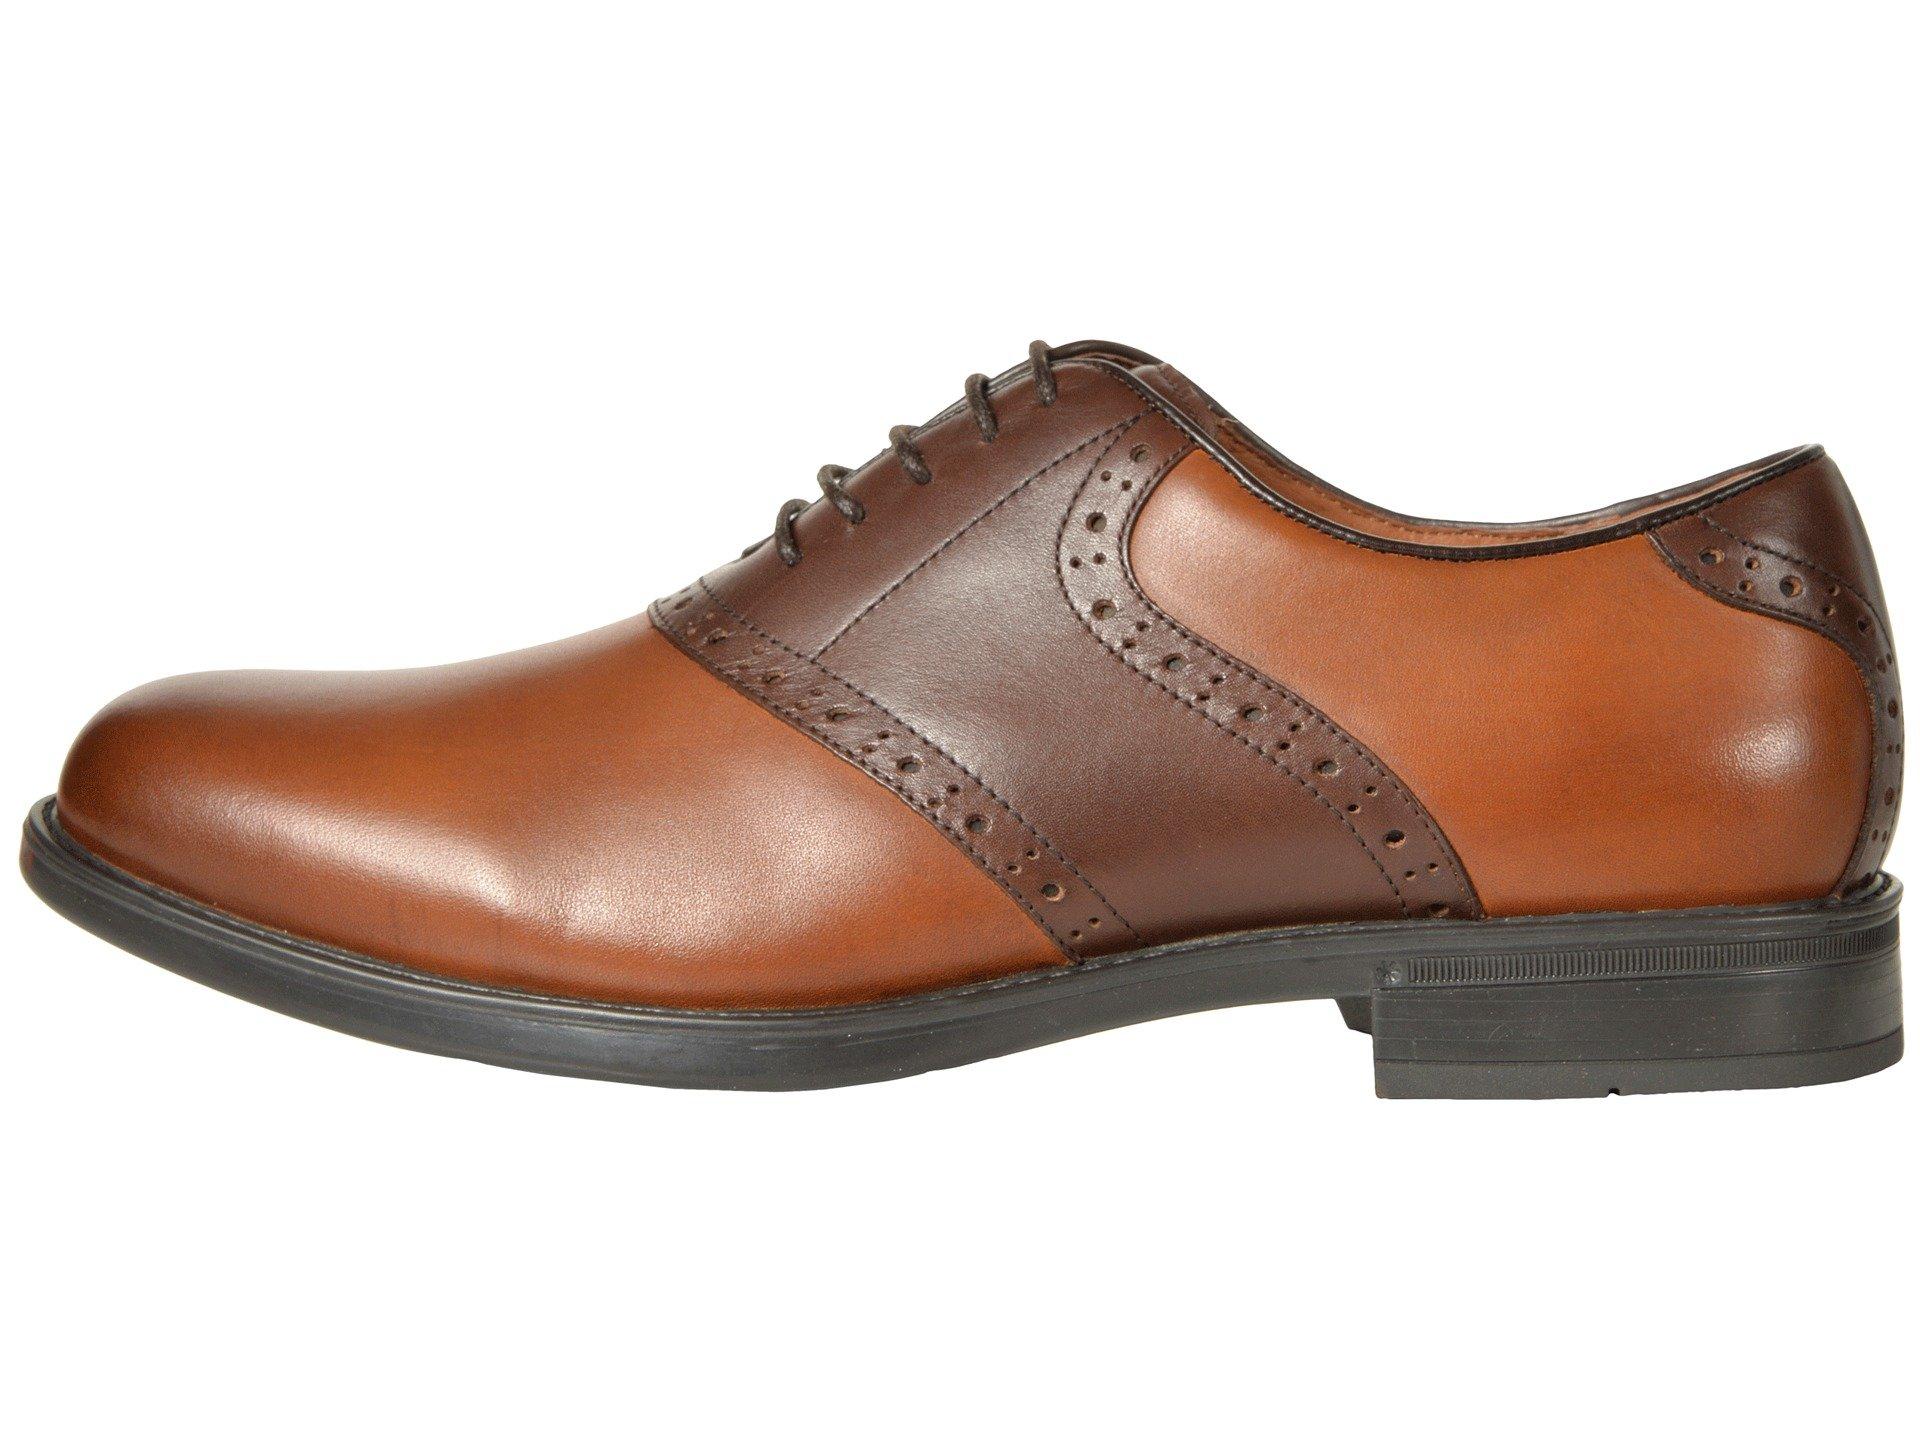 Oxford Brogue Shoes Black Streetwear